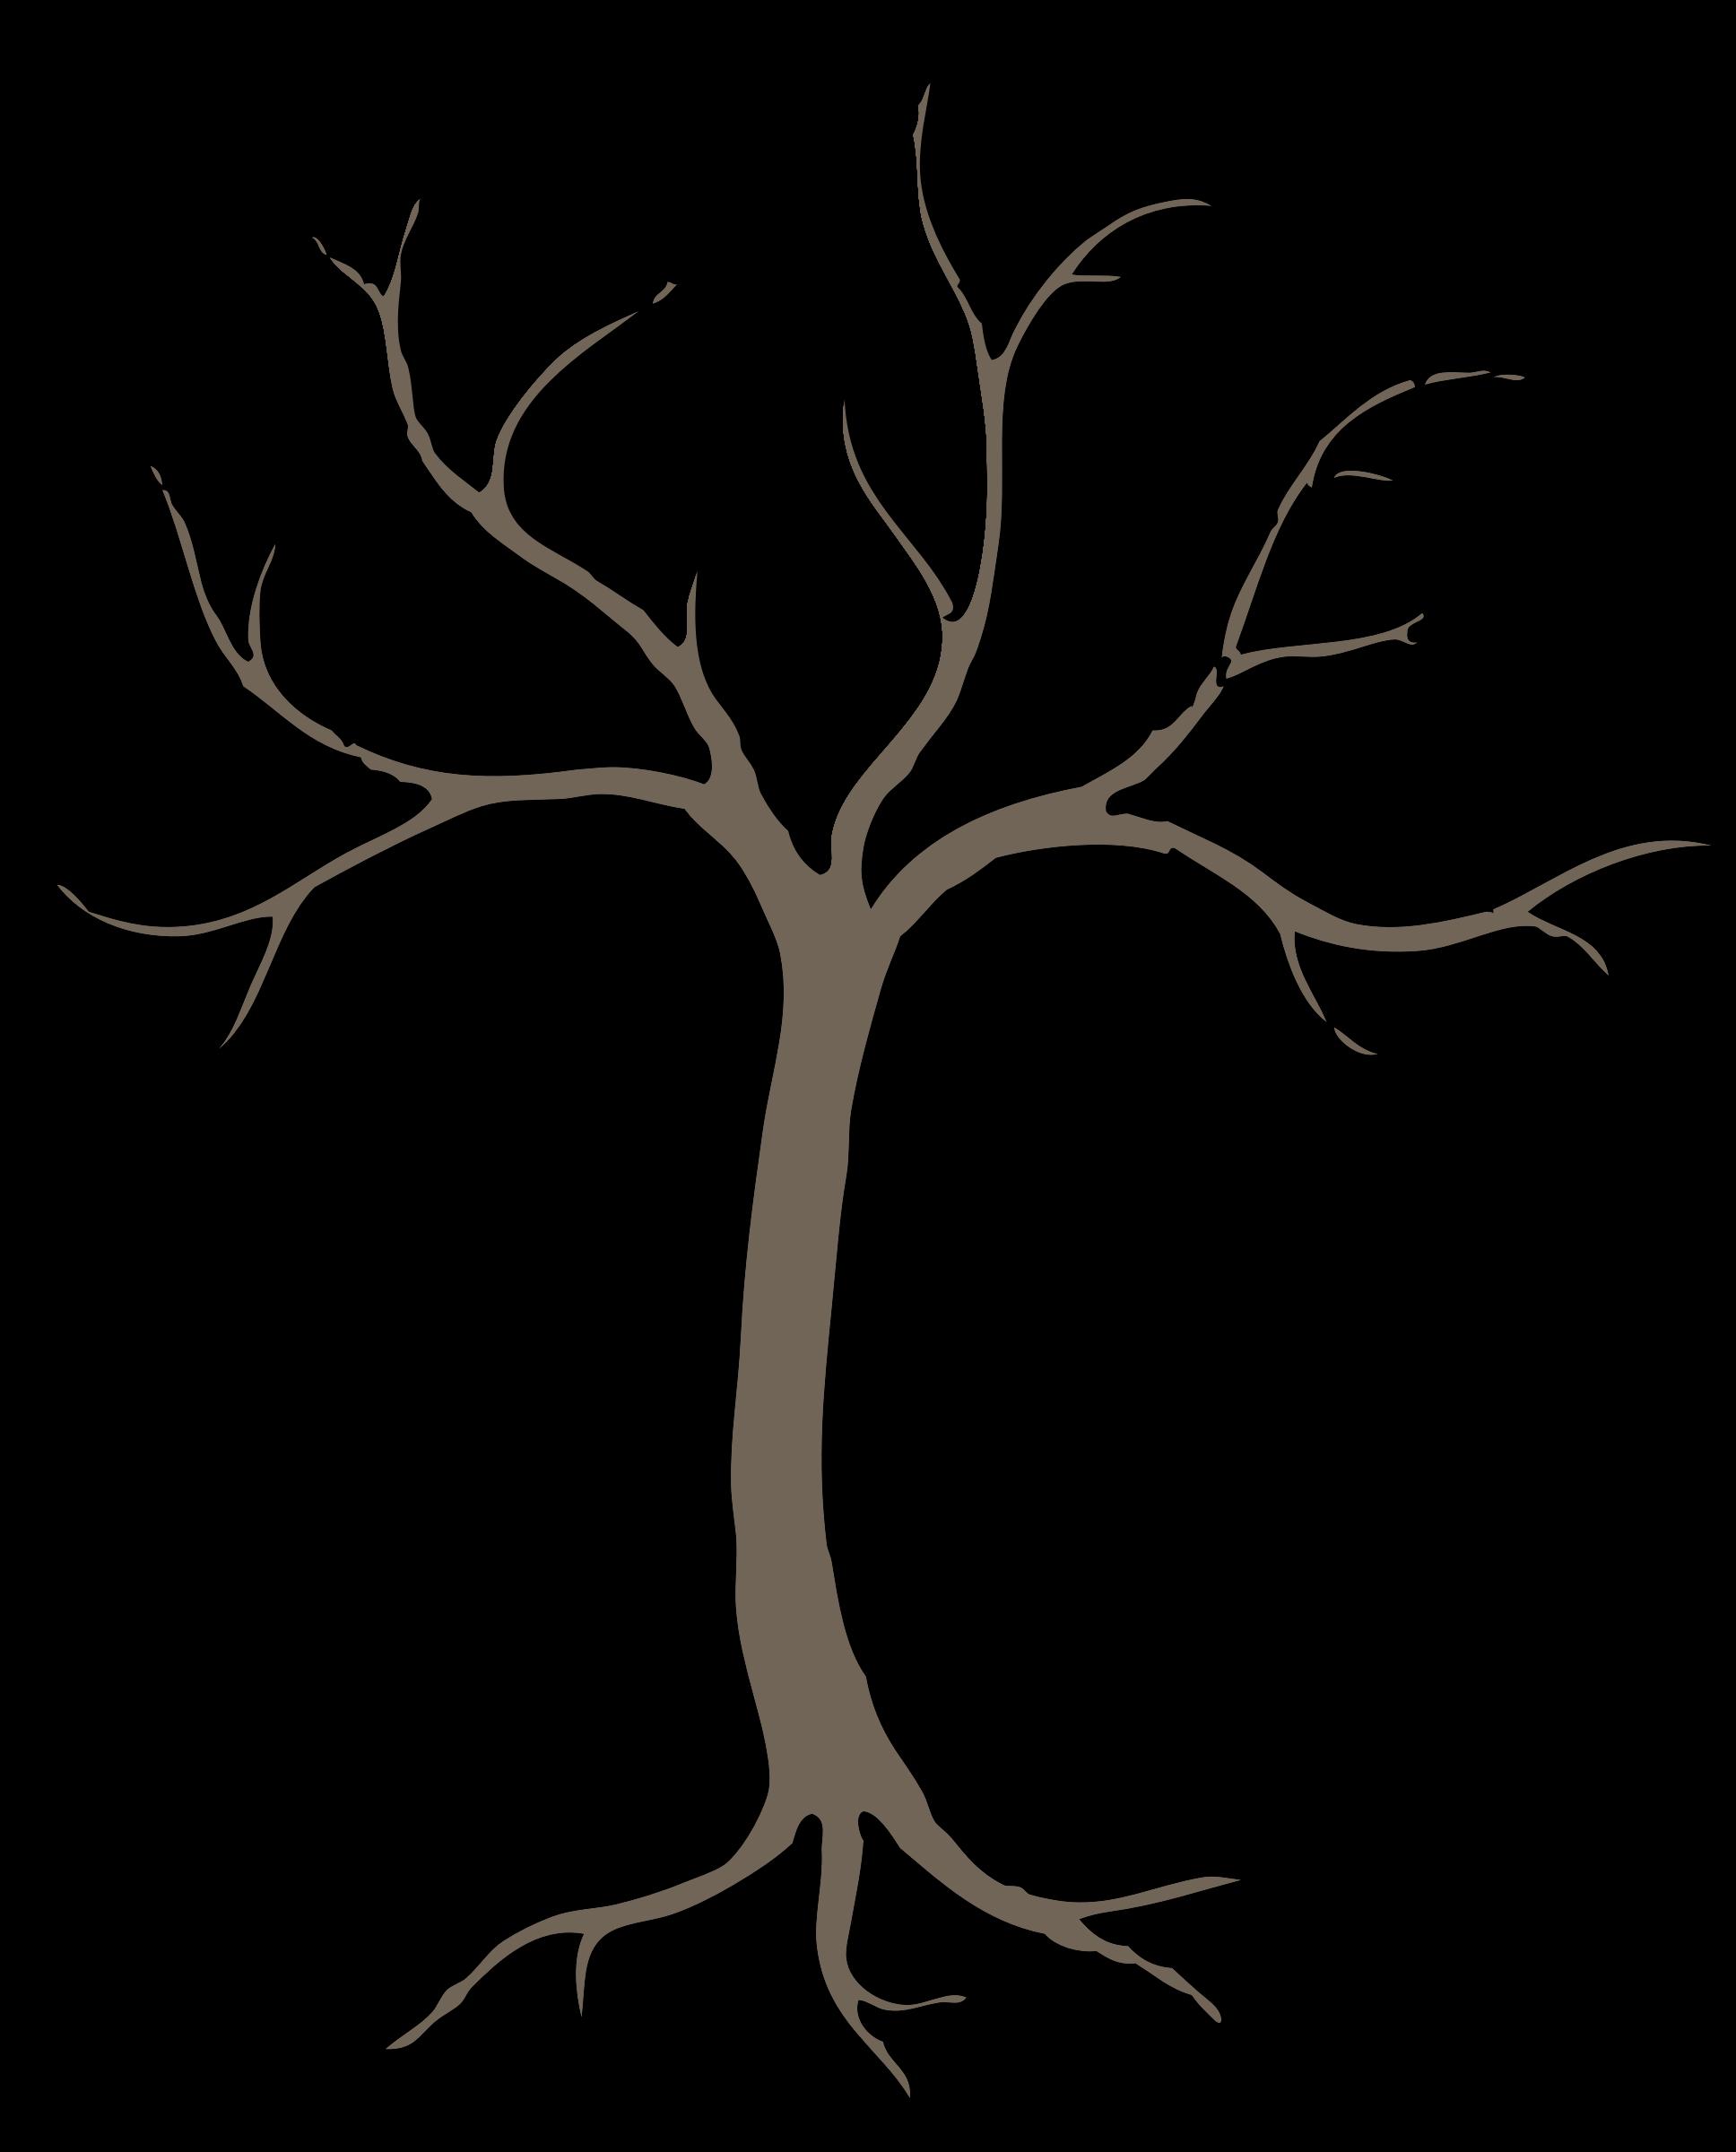 Barren clipart Barren tree tree Clipart barren